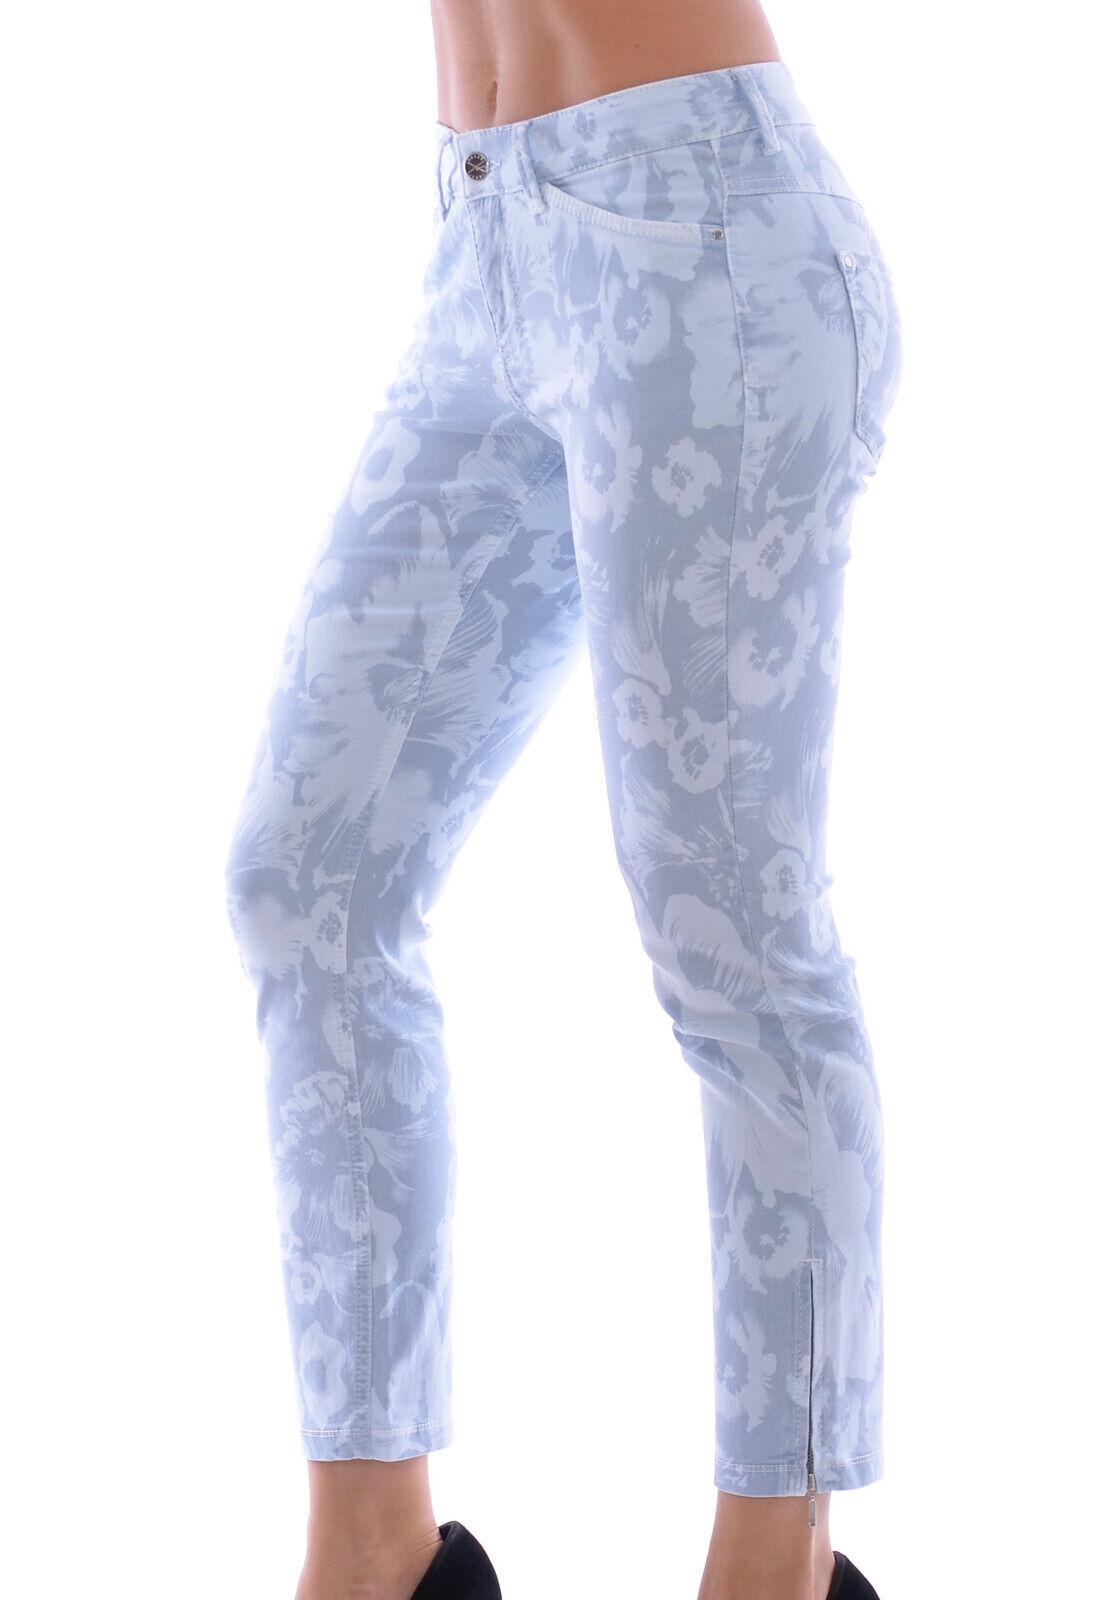 MAC Jeans Damen Dream Summer Chic  Stretch Light Blau Flower Gr. 34 36   L27